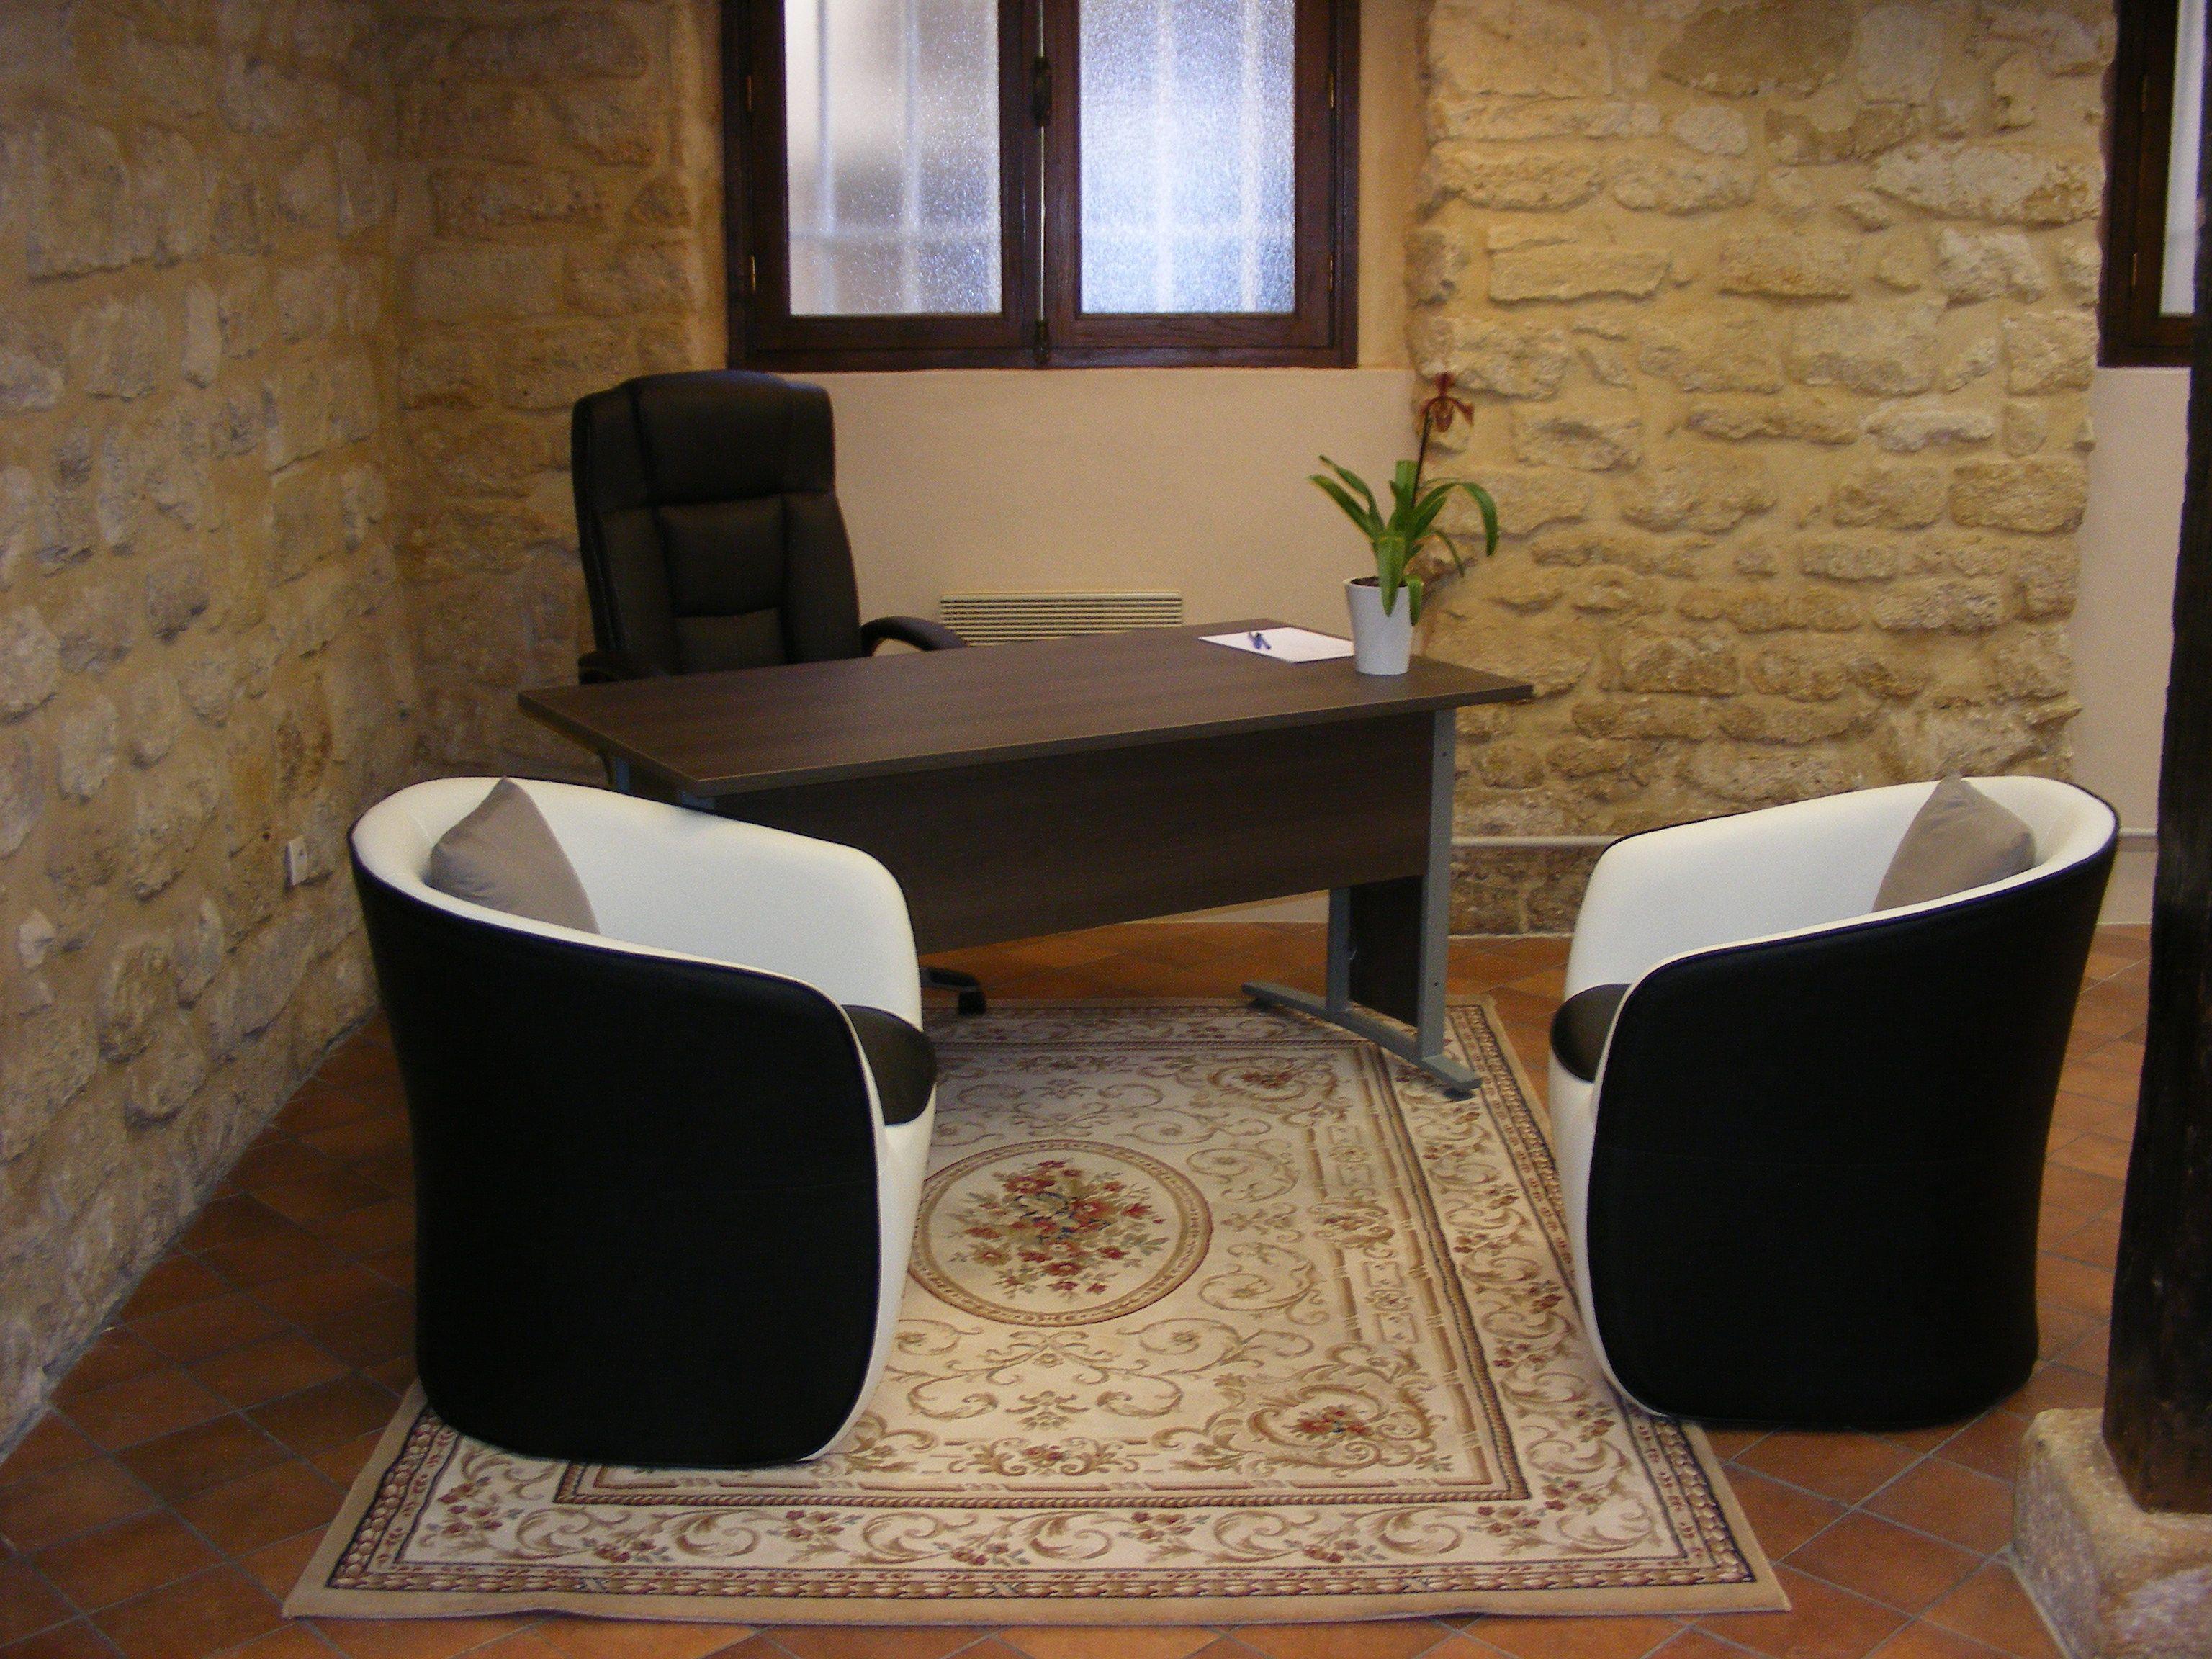 cabinet bastille des psychologues vous accueillent. Black Bedroom Furniture Sets. Home Design Ideas